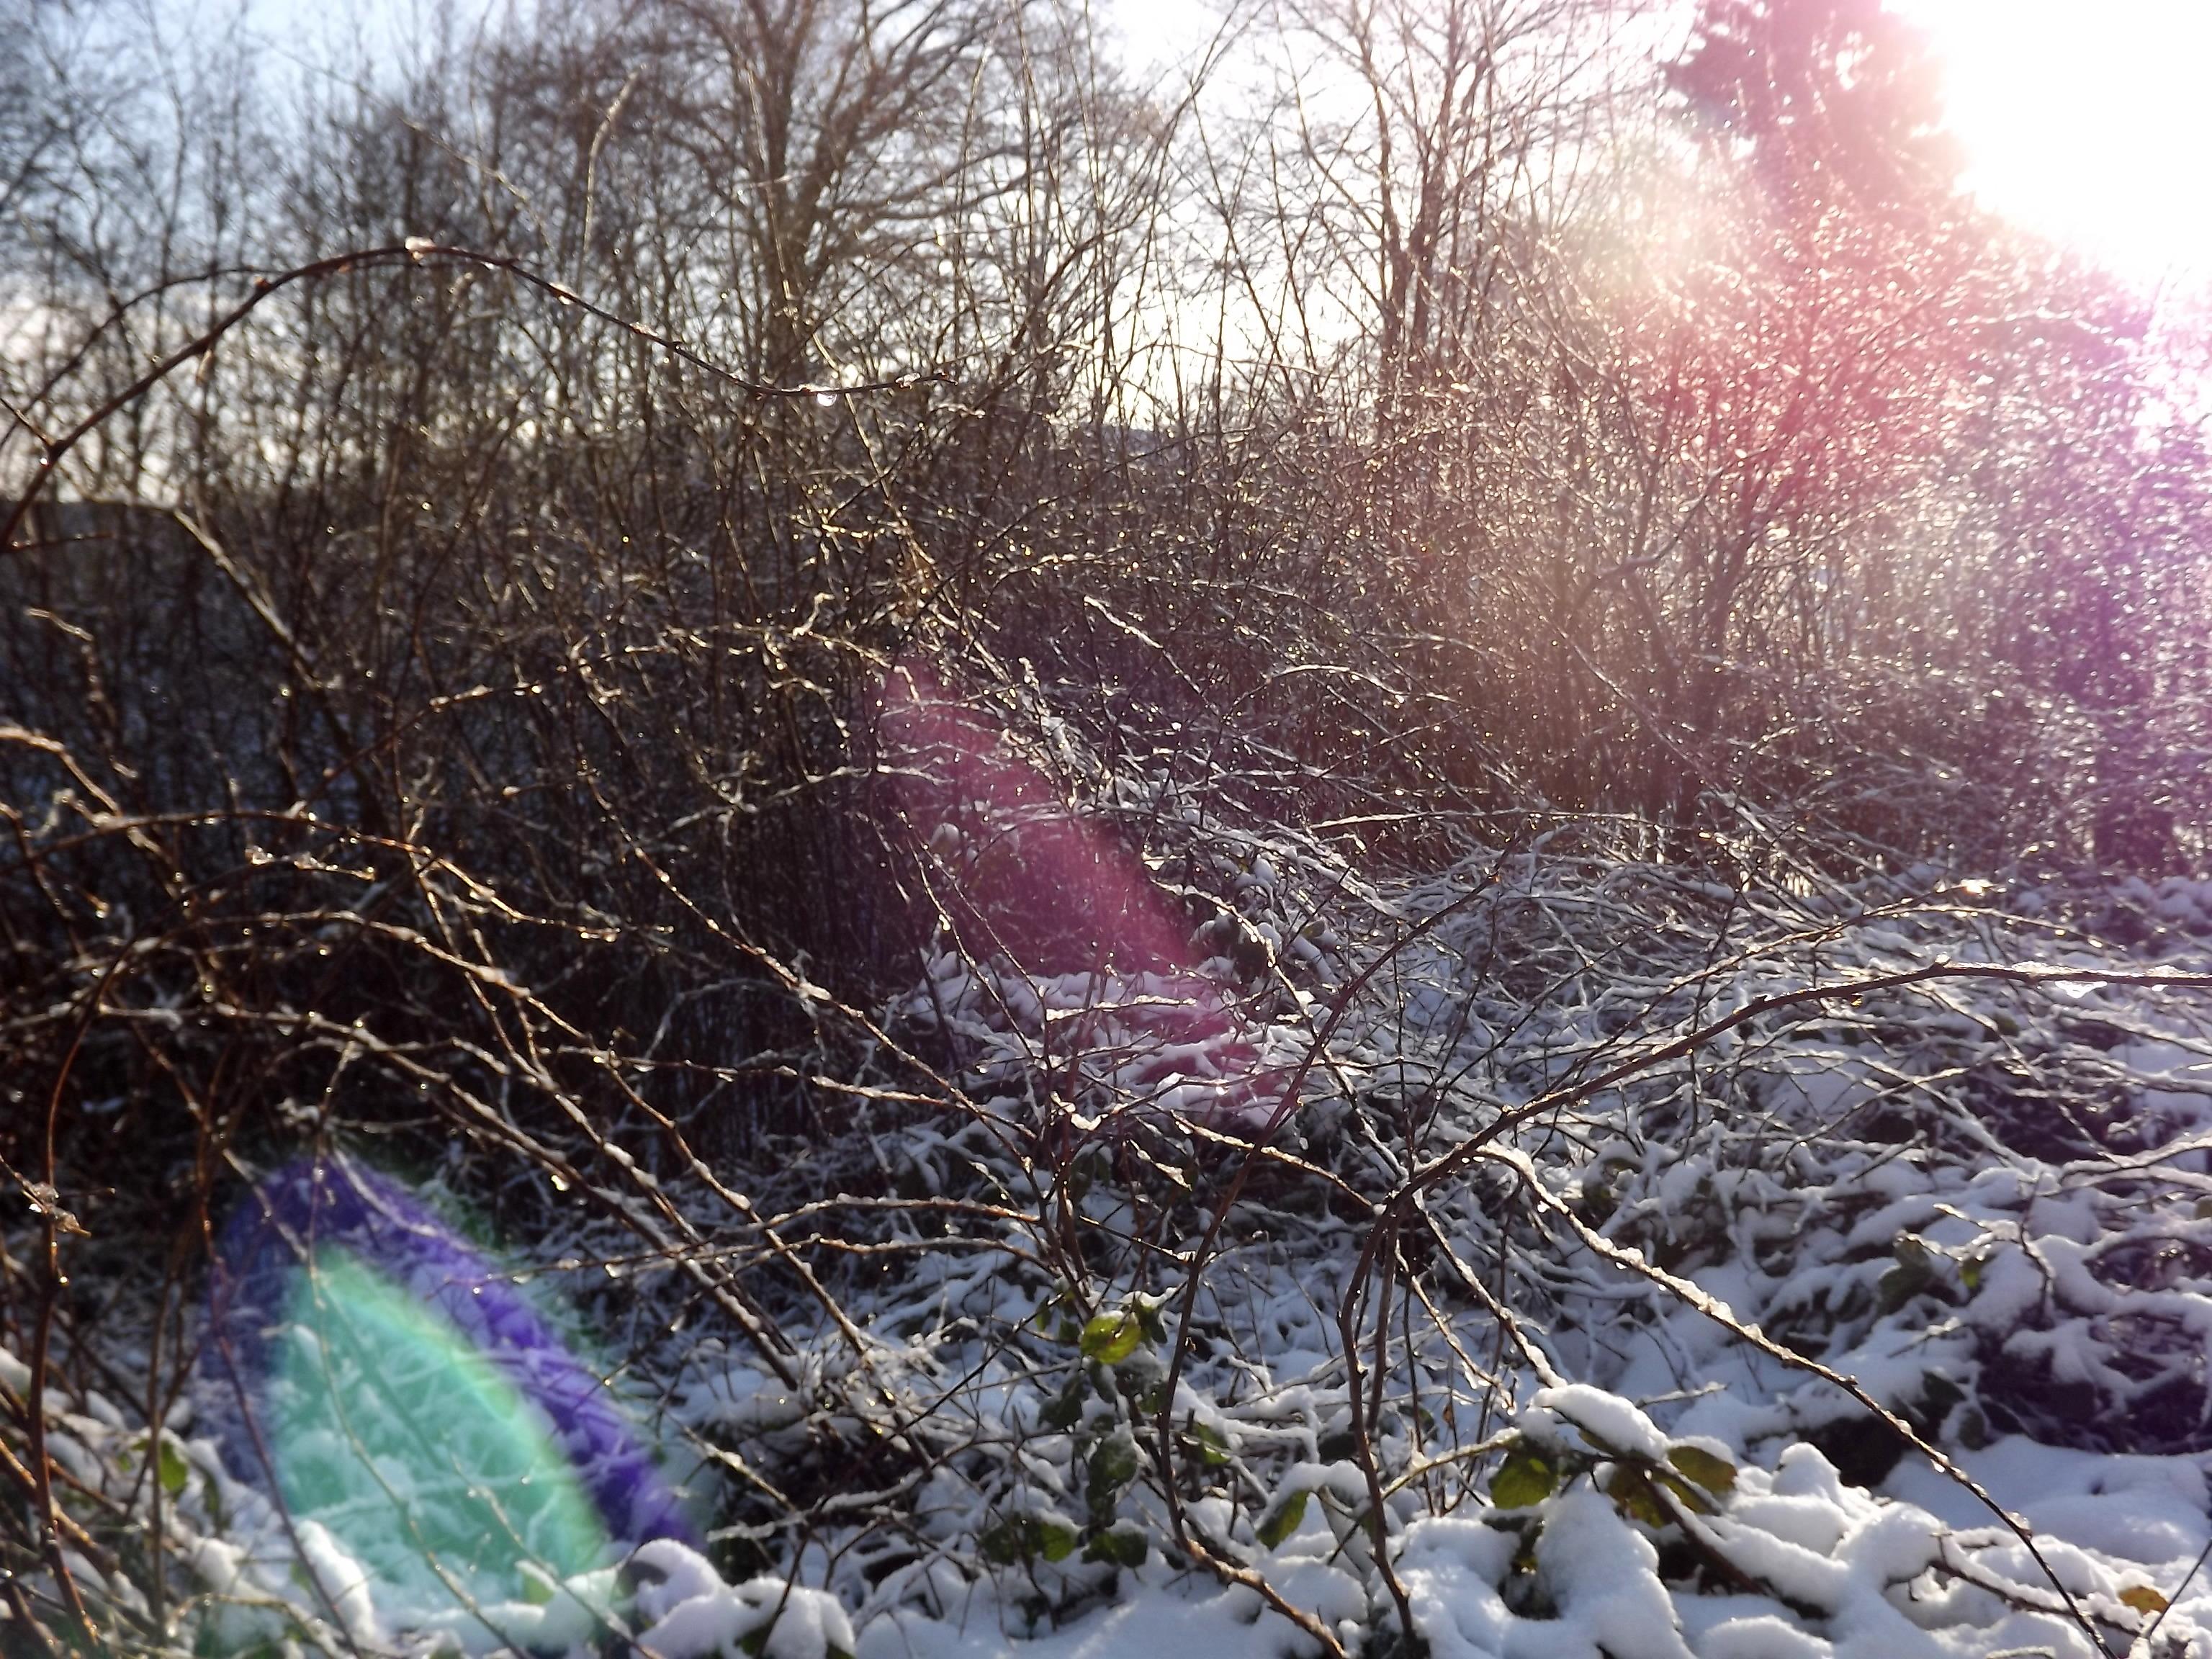 5766-schnee-natur-lensflare